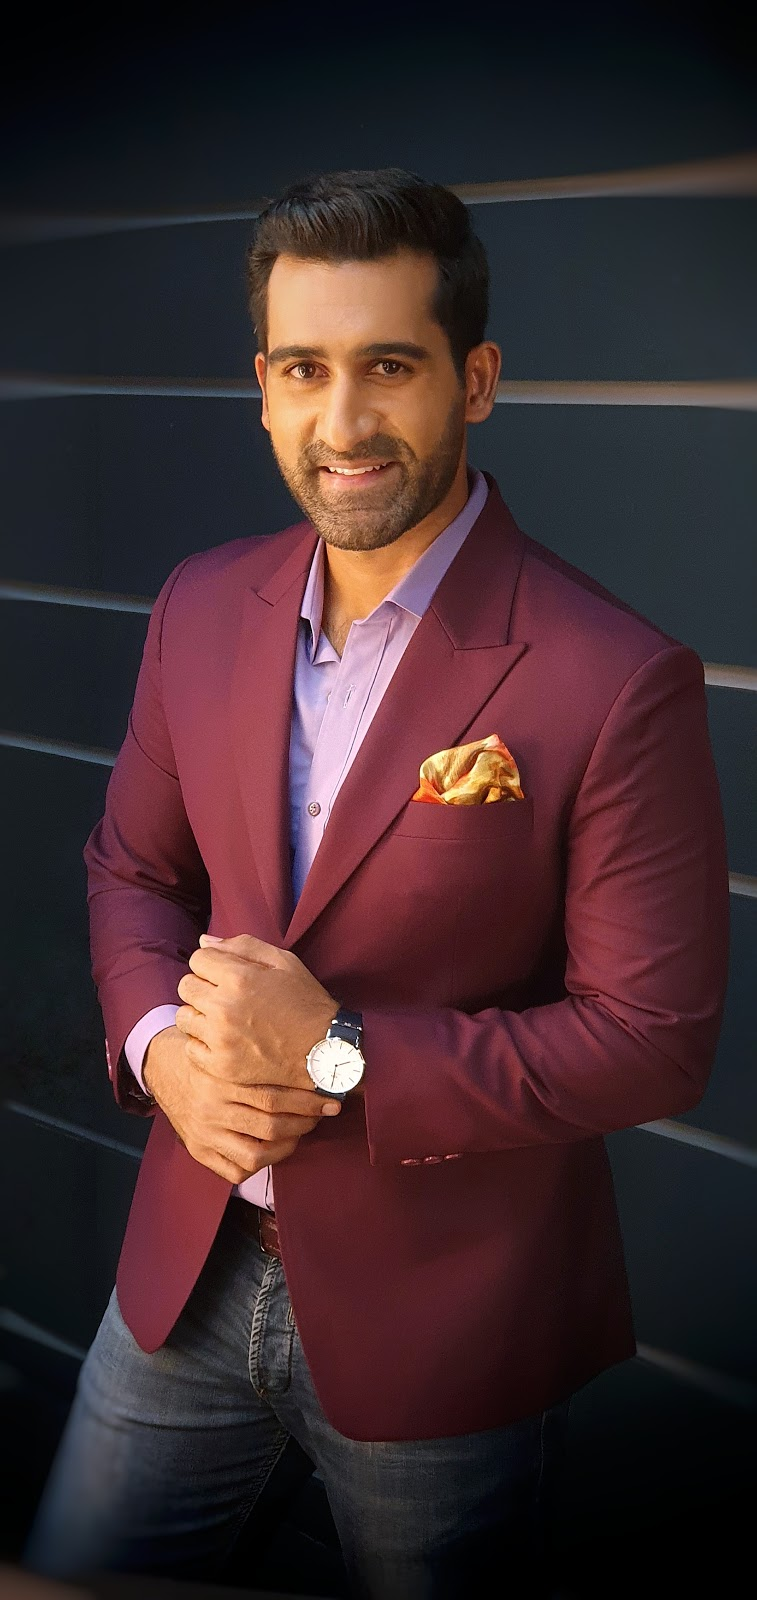 Suhail Chandhok, founder, SuperCric and IPL presenter